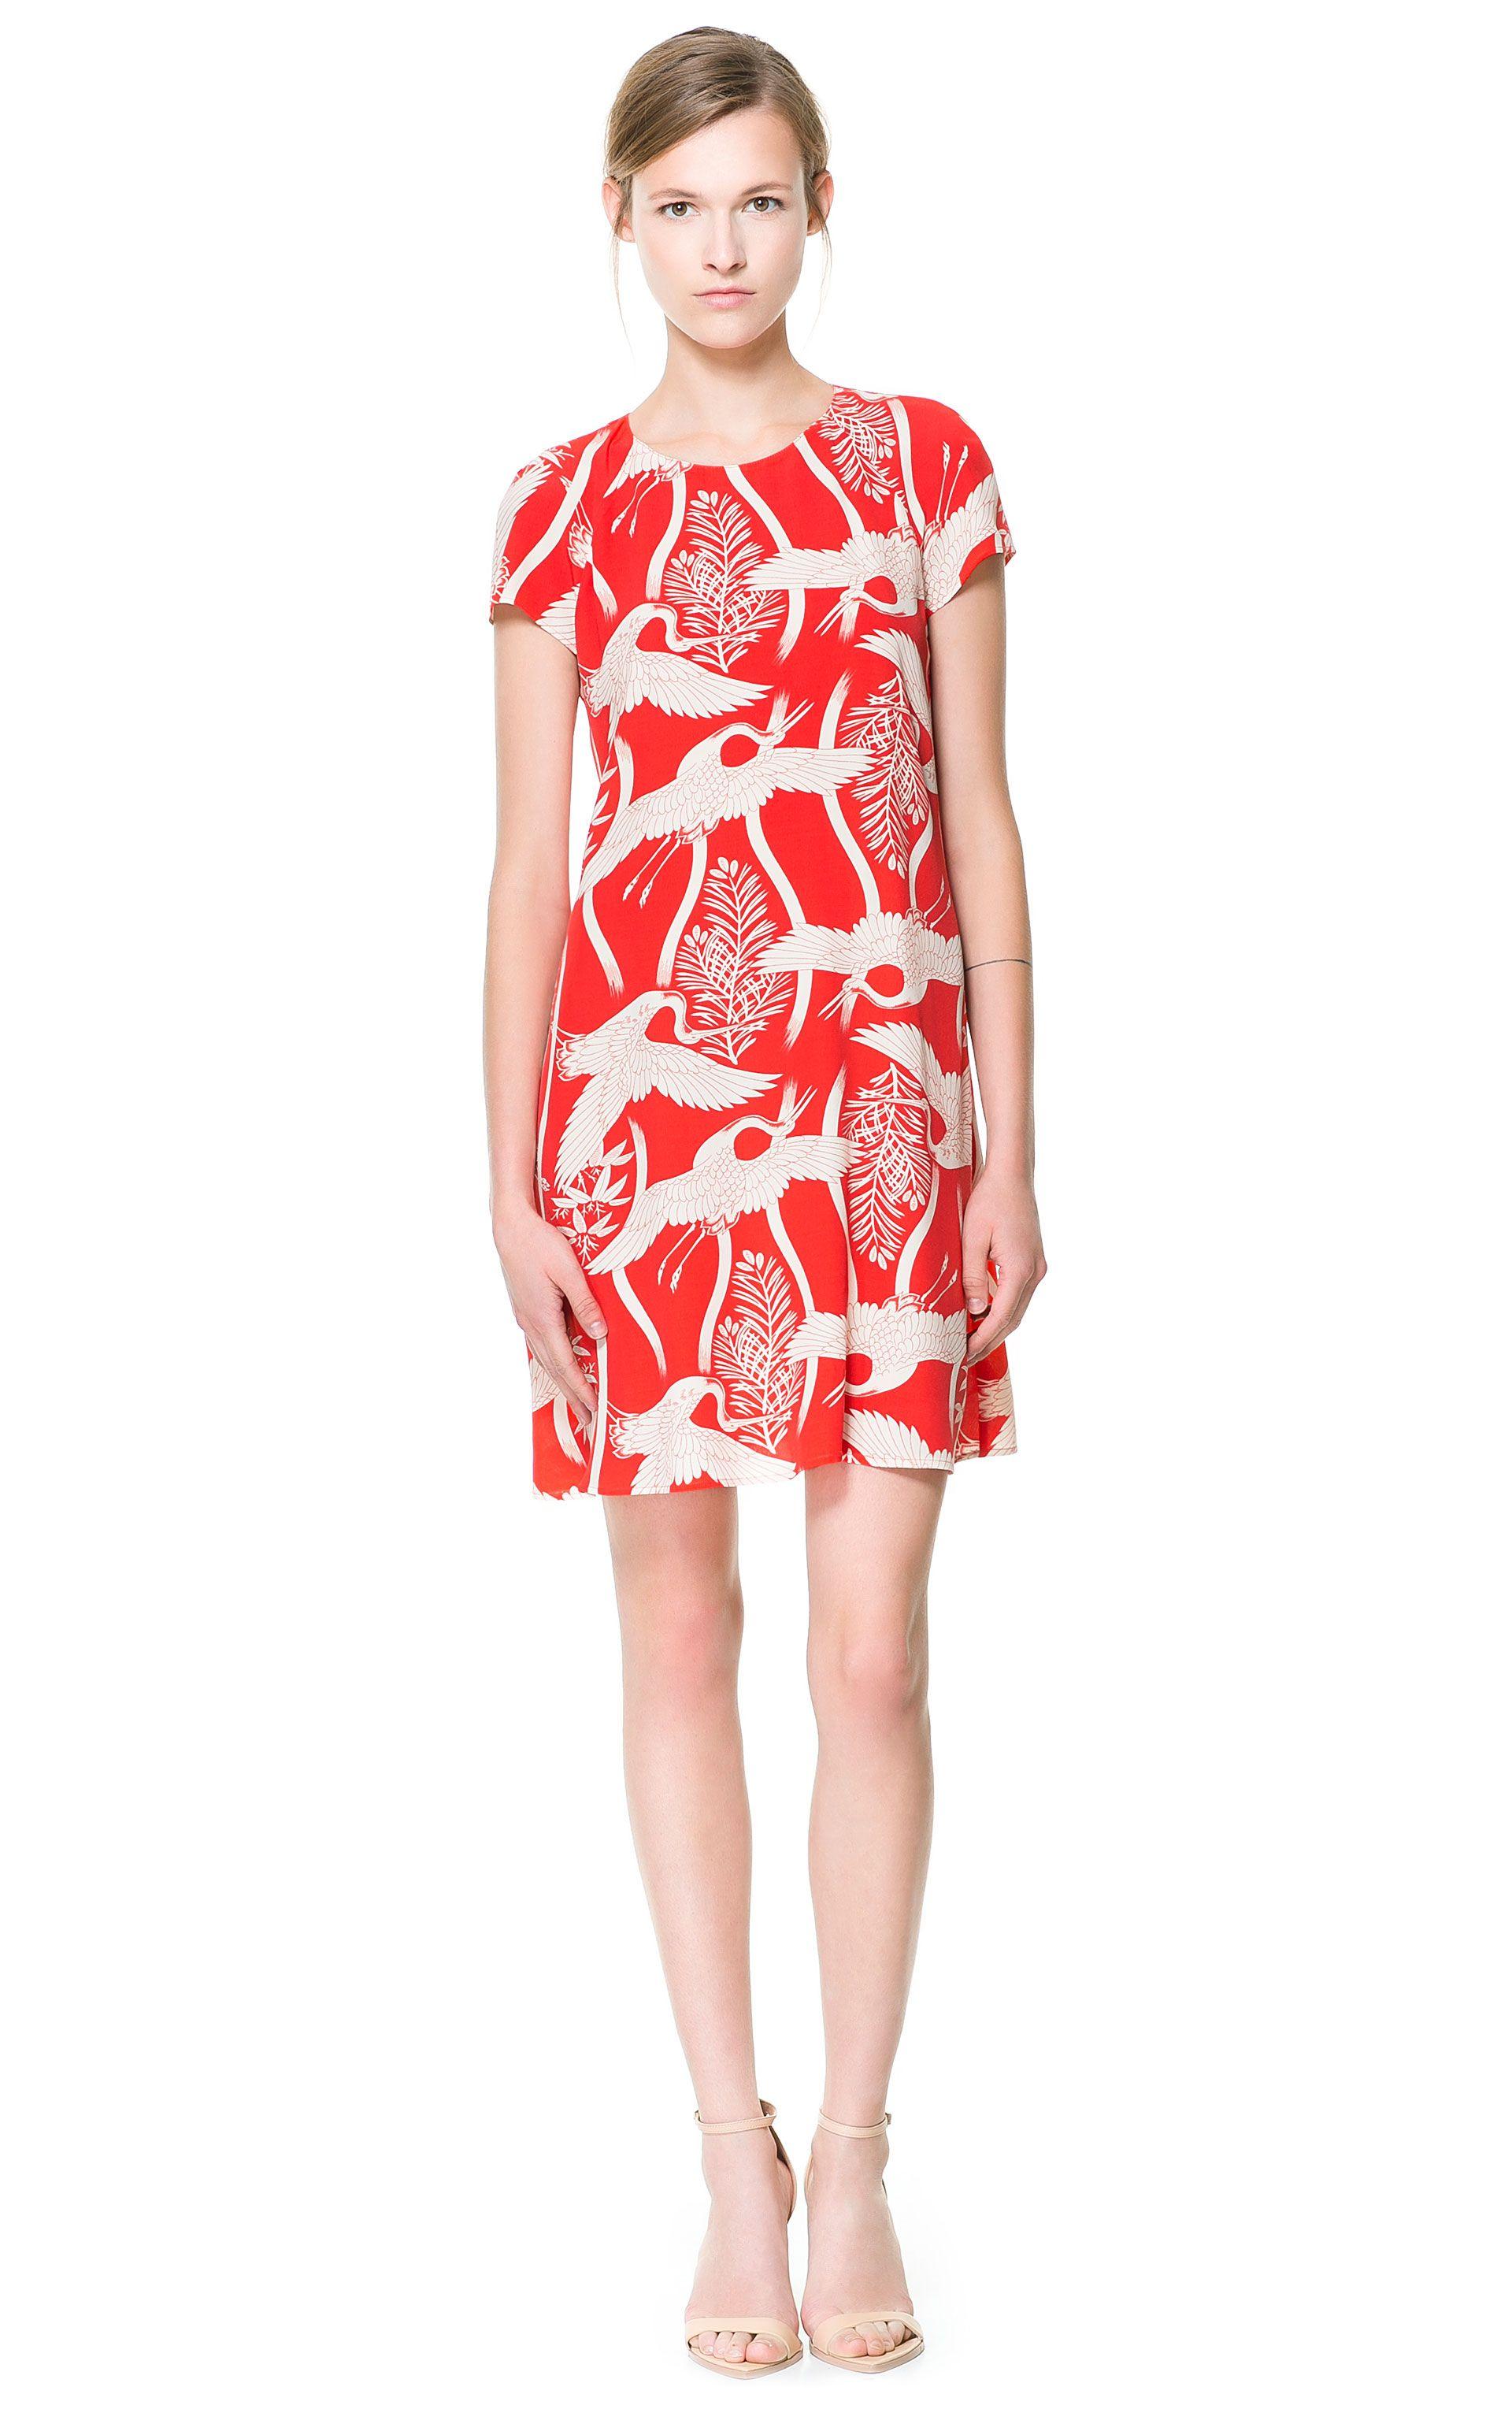 BIRD PRINT DRESS - Zara | What I would wear.... | Pinterest | Ropa